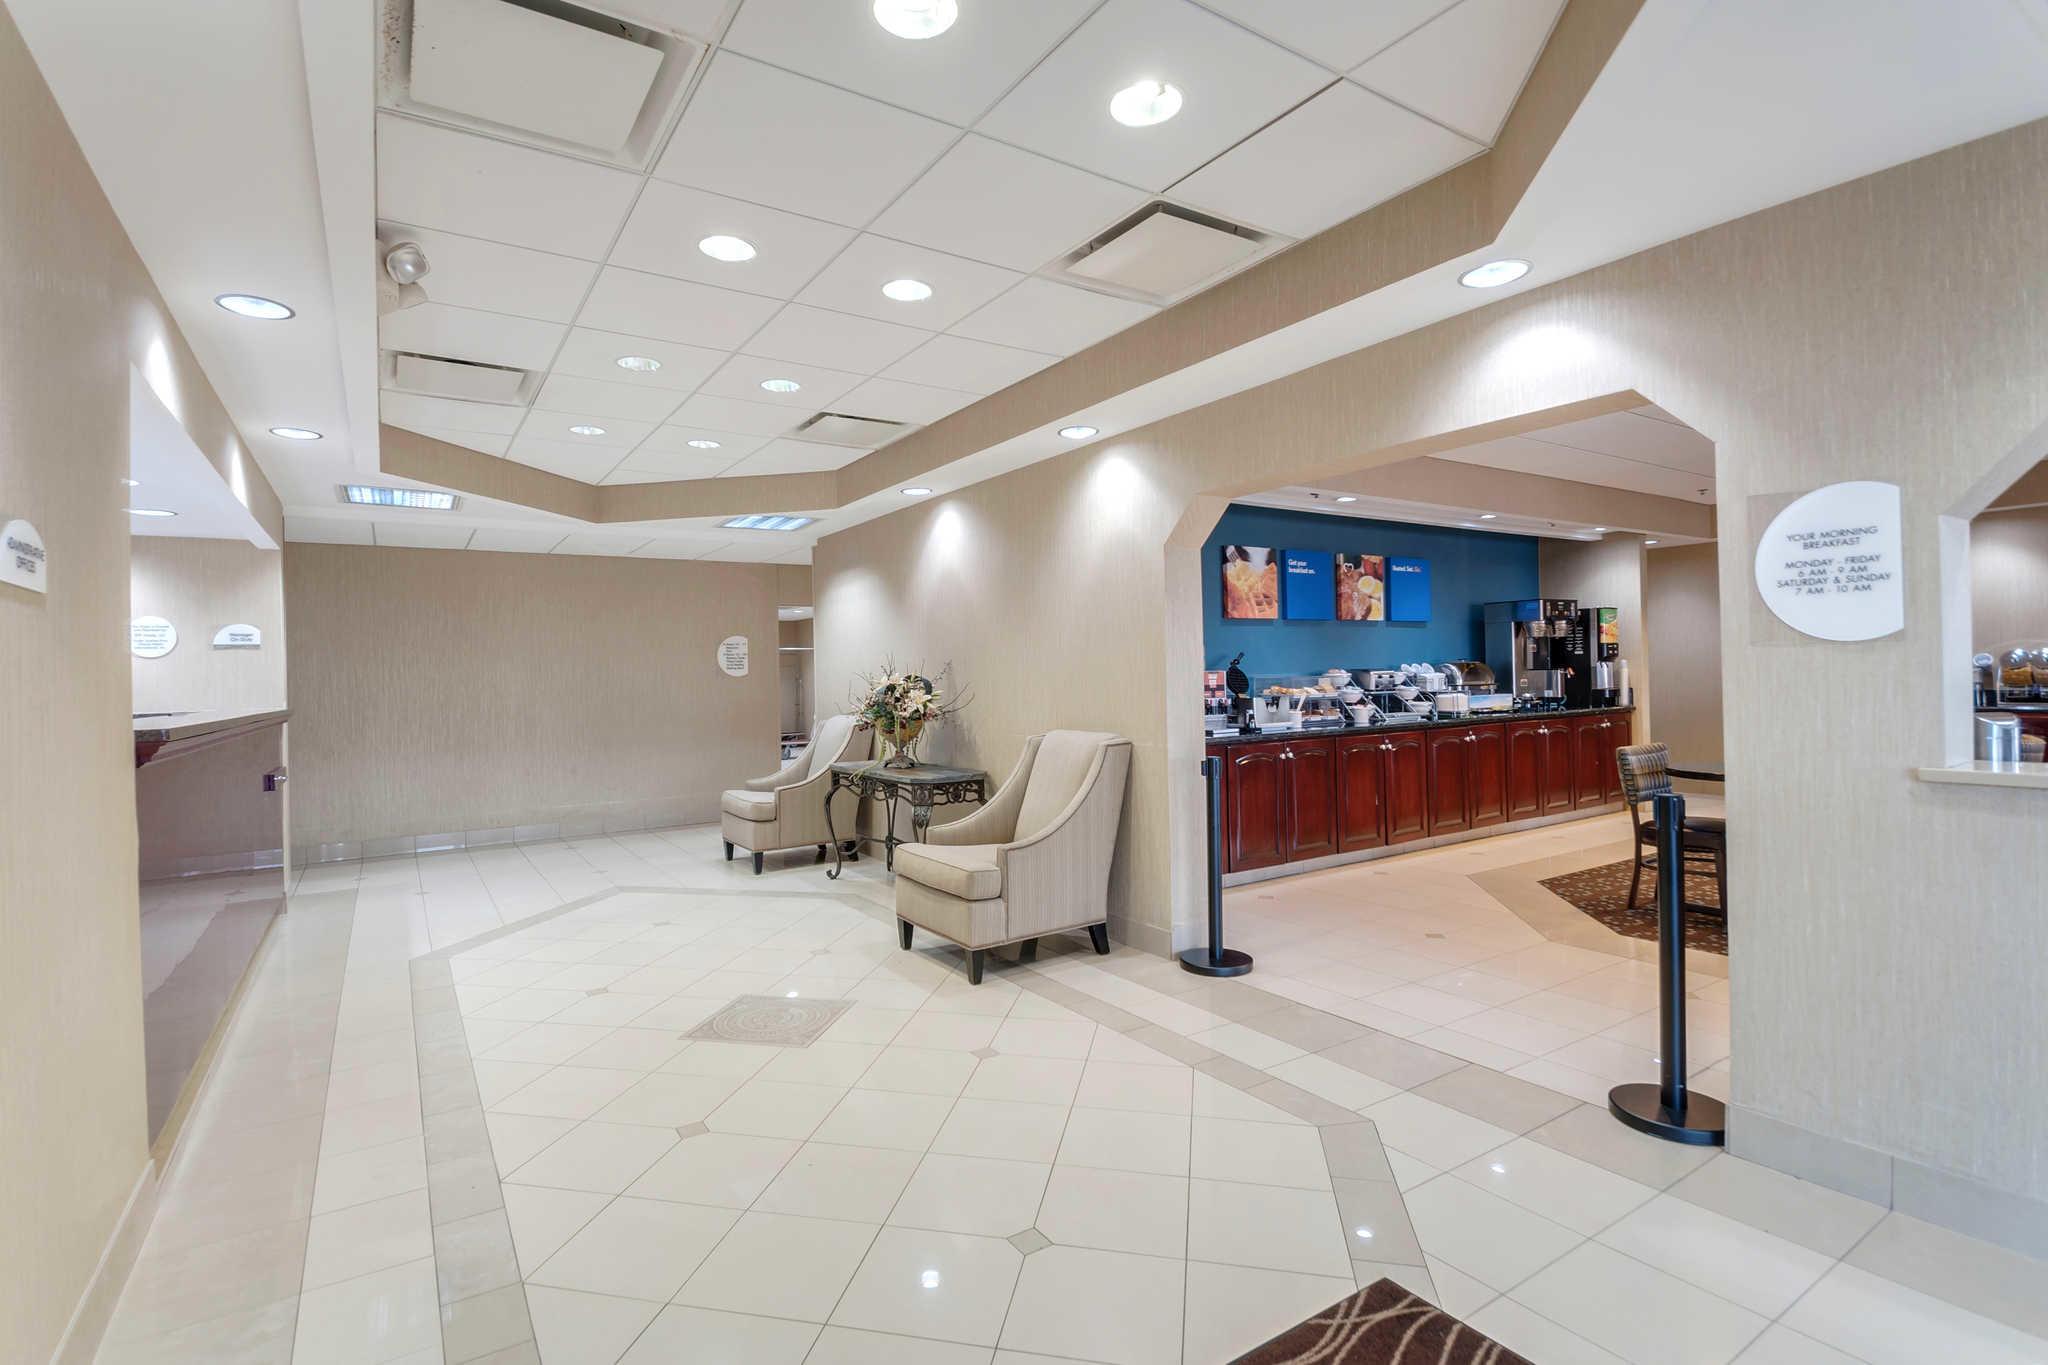 Comfort Inn & Suites Edgewood - Aberdeen image 5